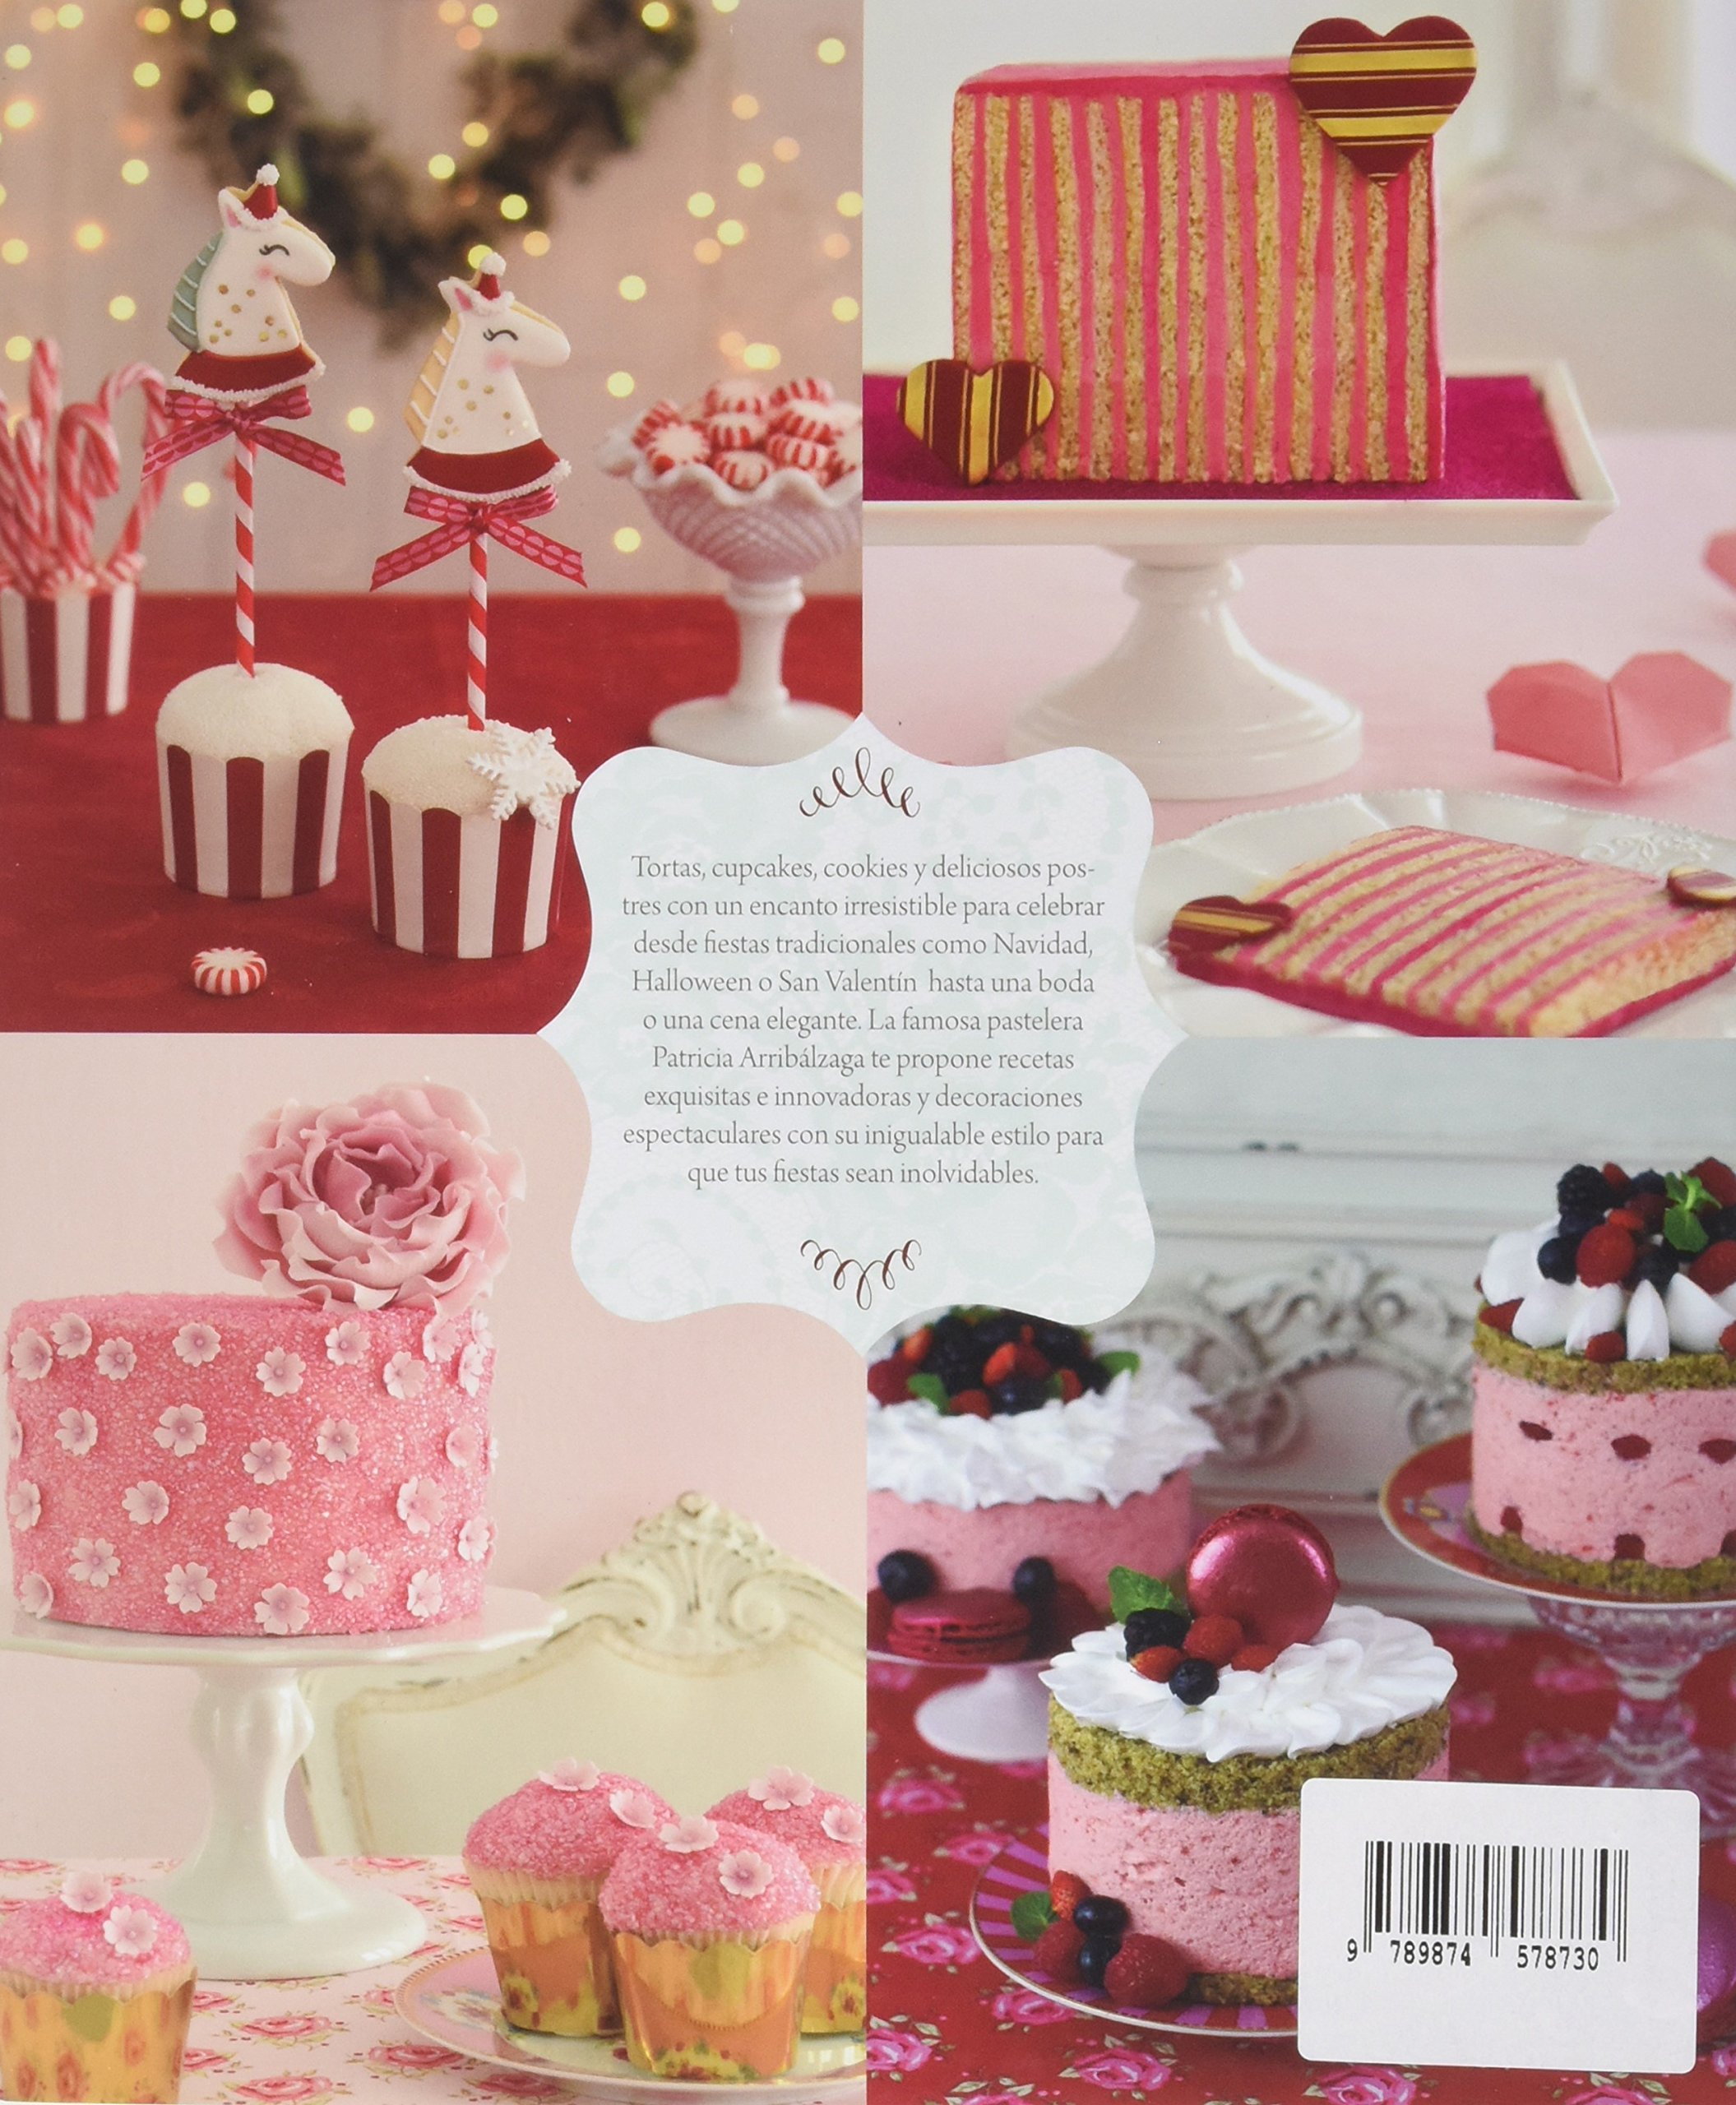 Fiestas dulces (Spanish Edition): Patricia Arribalzaga: 9789874578730: Amazon.com: Books